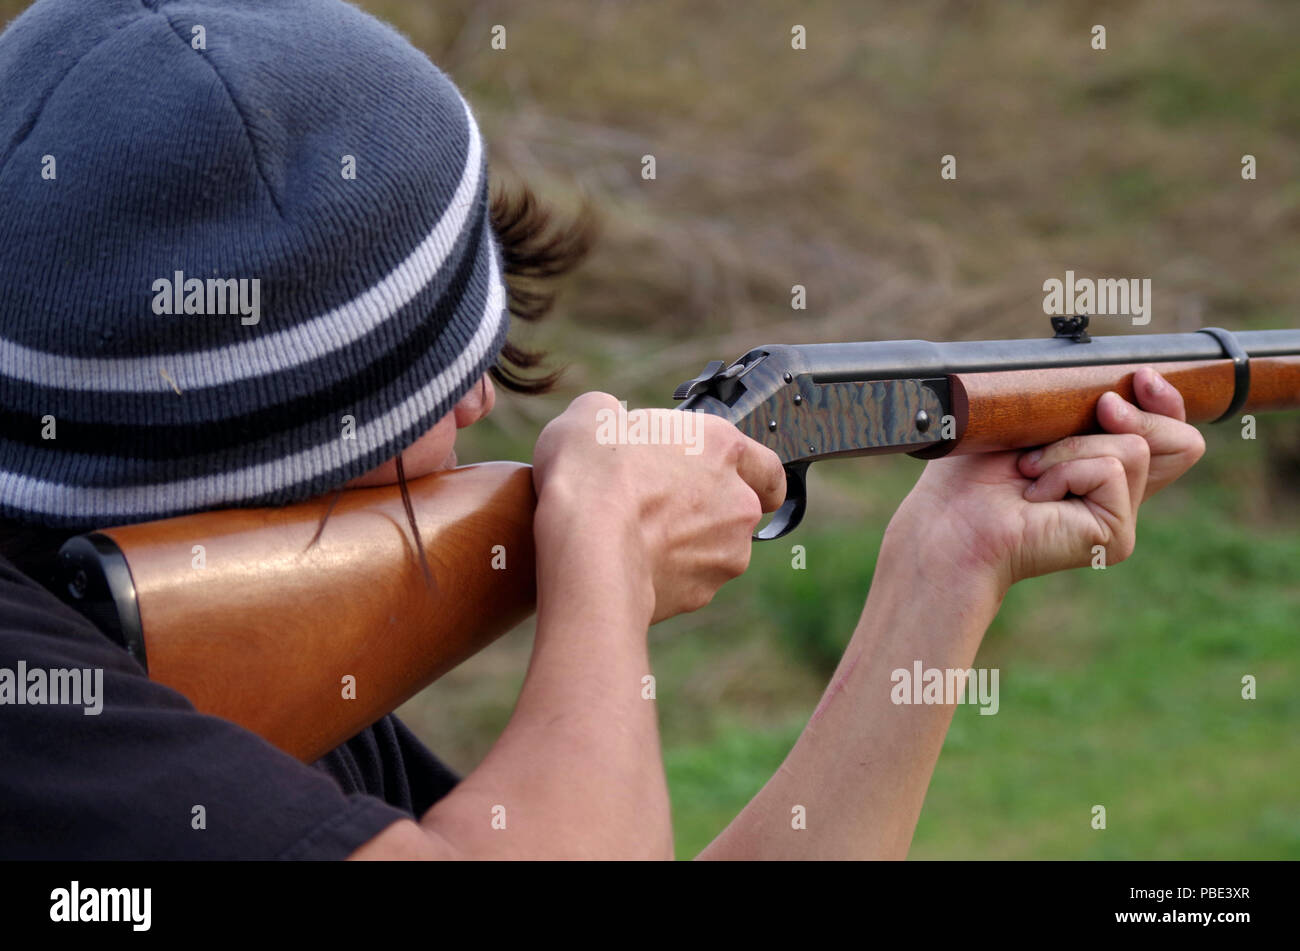 Young man shooting an H&R .44 Magnum rifle at a Corpus Christi, Texas gun range. - Stock Image